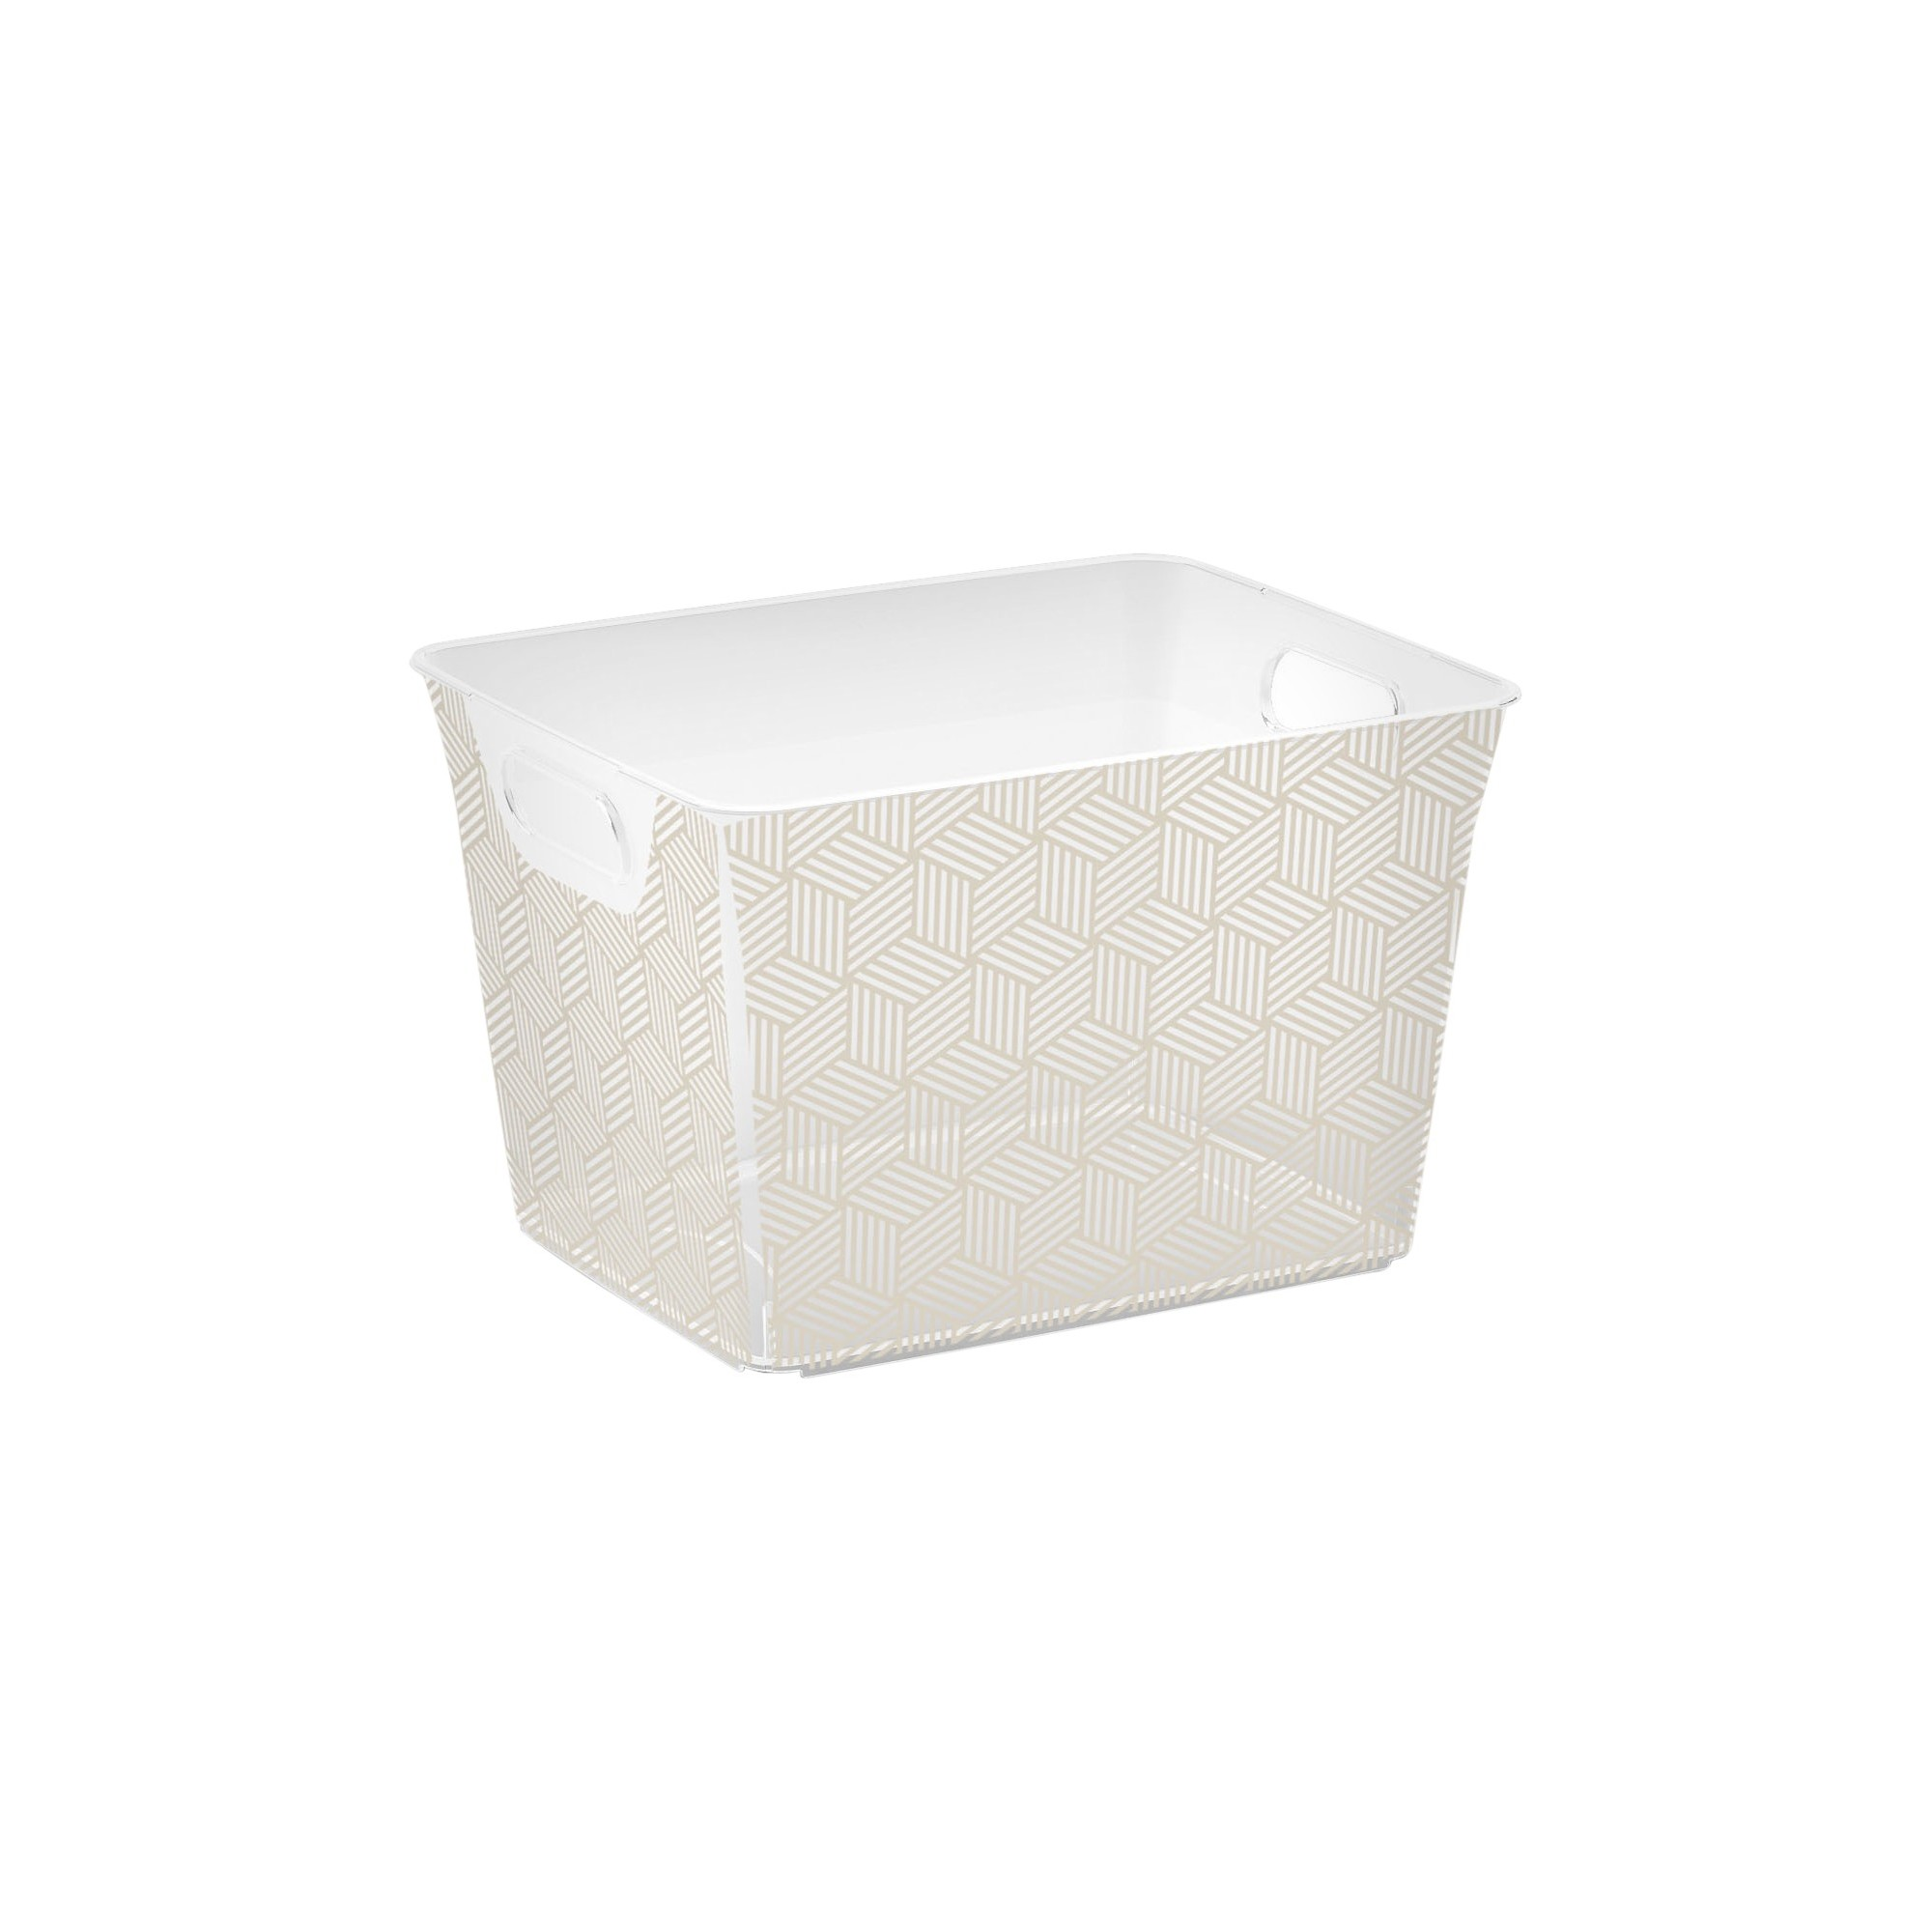 Cube Storage Bin - Gray Geometric - M -Kis